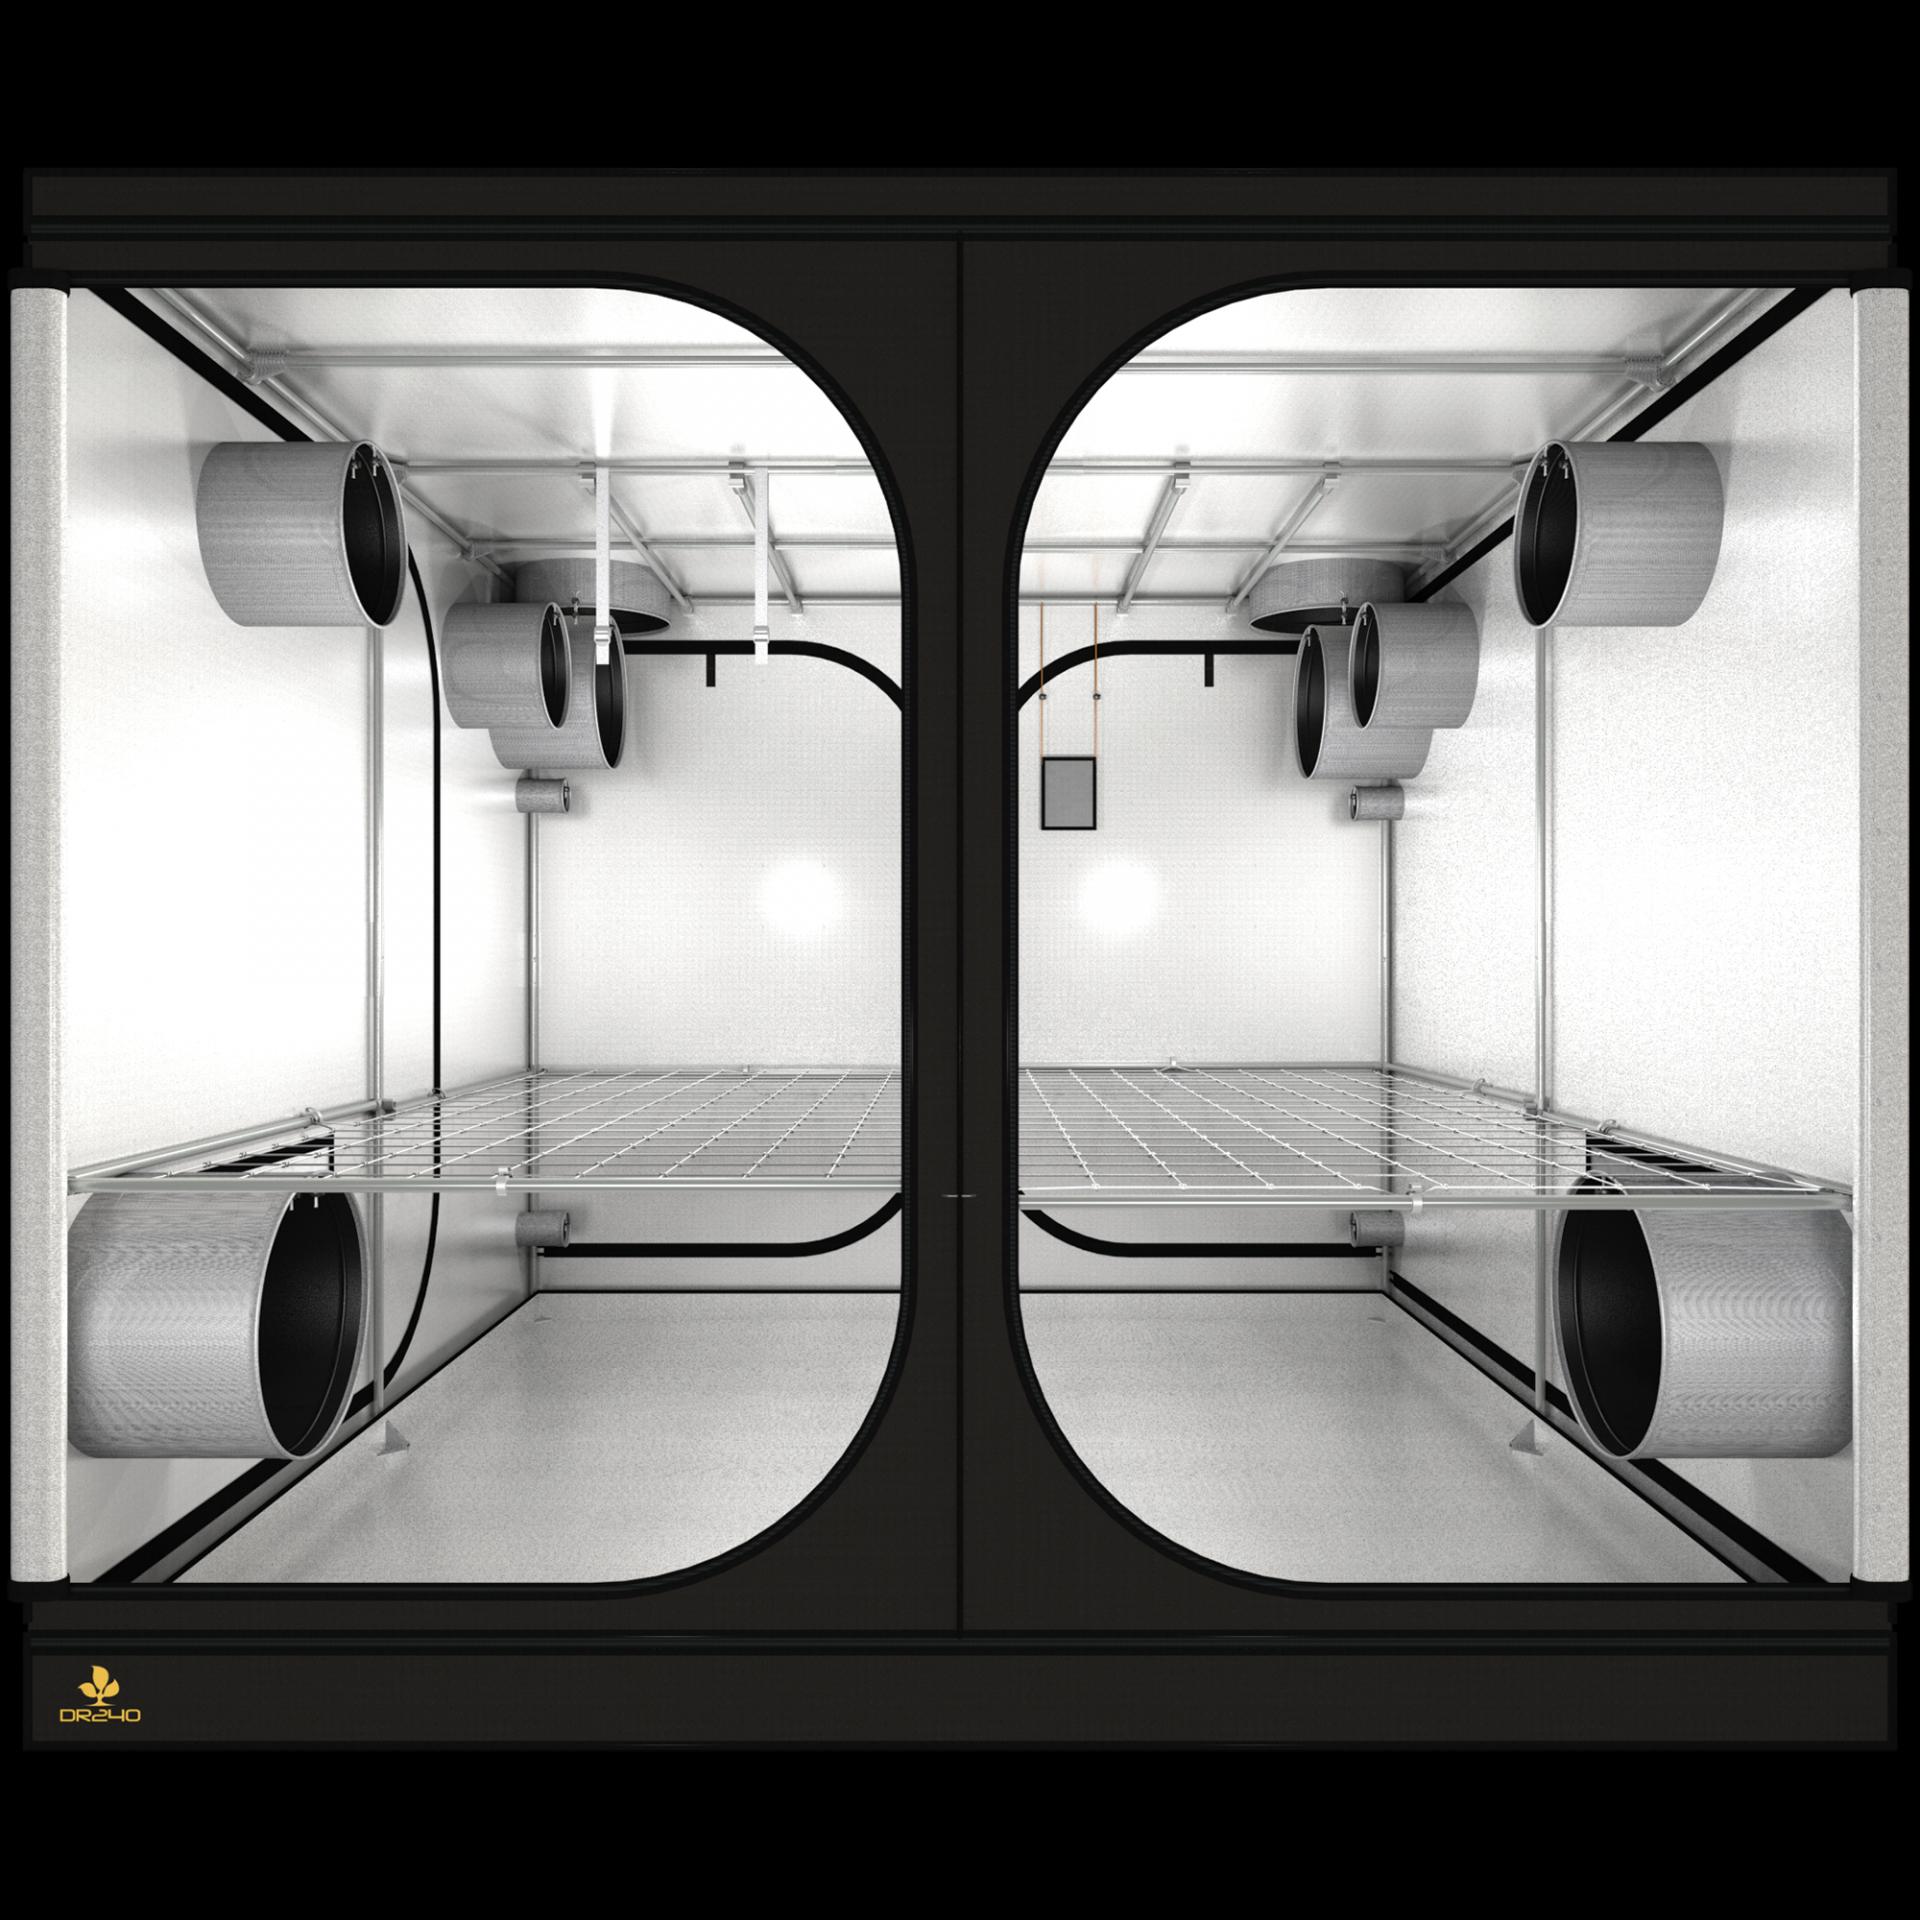 Dark Room 240W R3.0